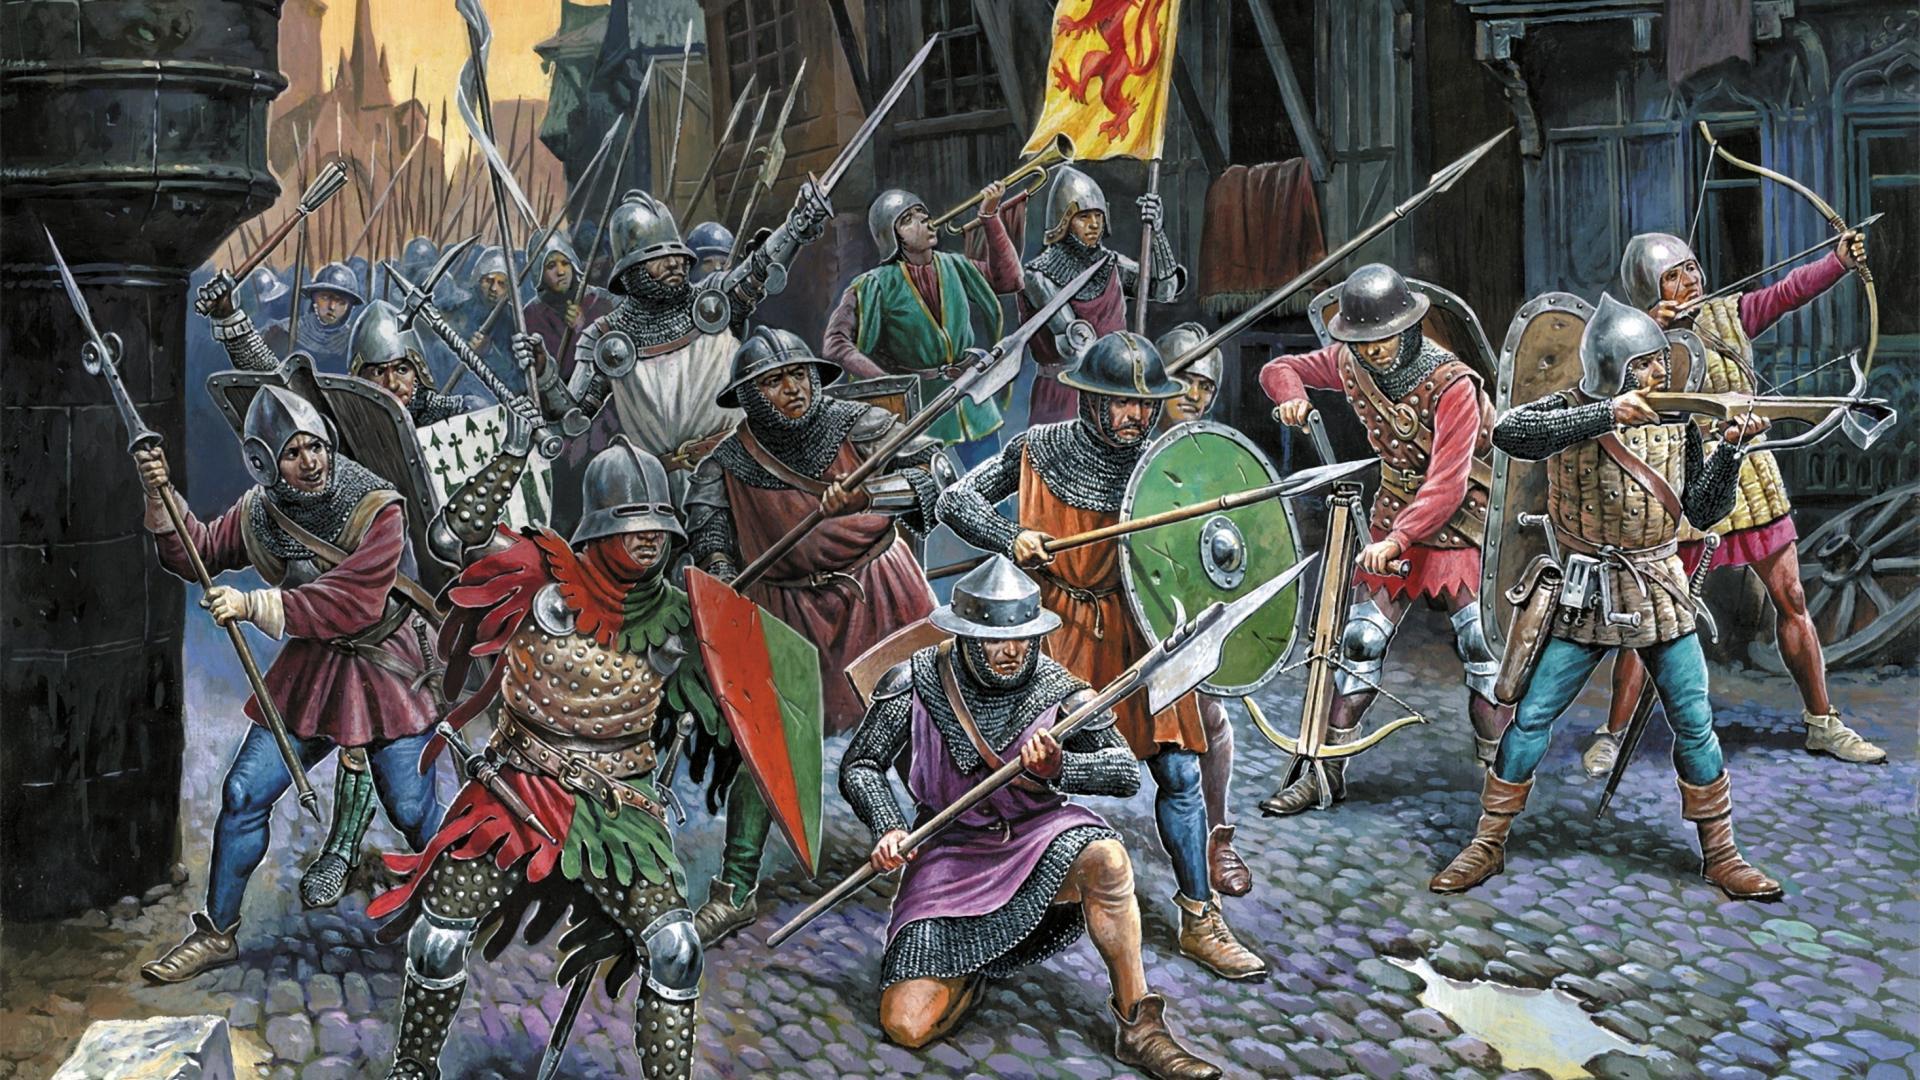 medieval-battle-painting-wallpaper-1.jpg